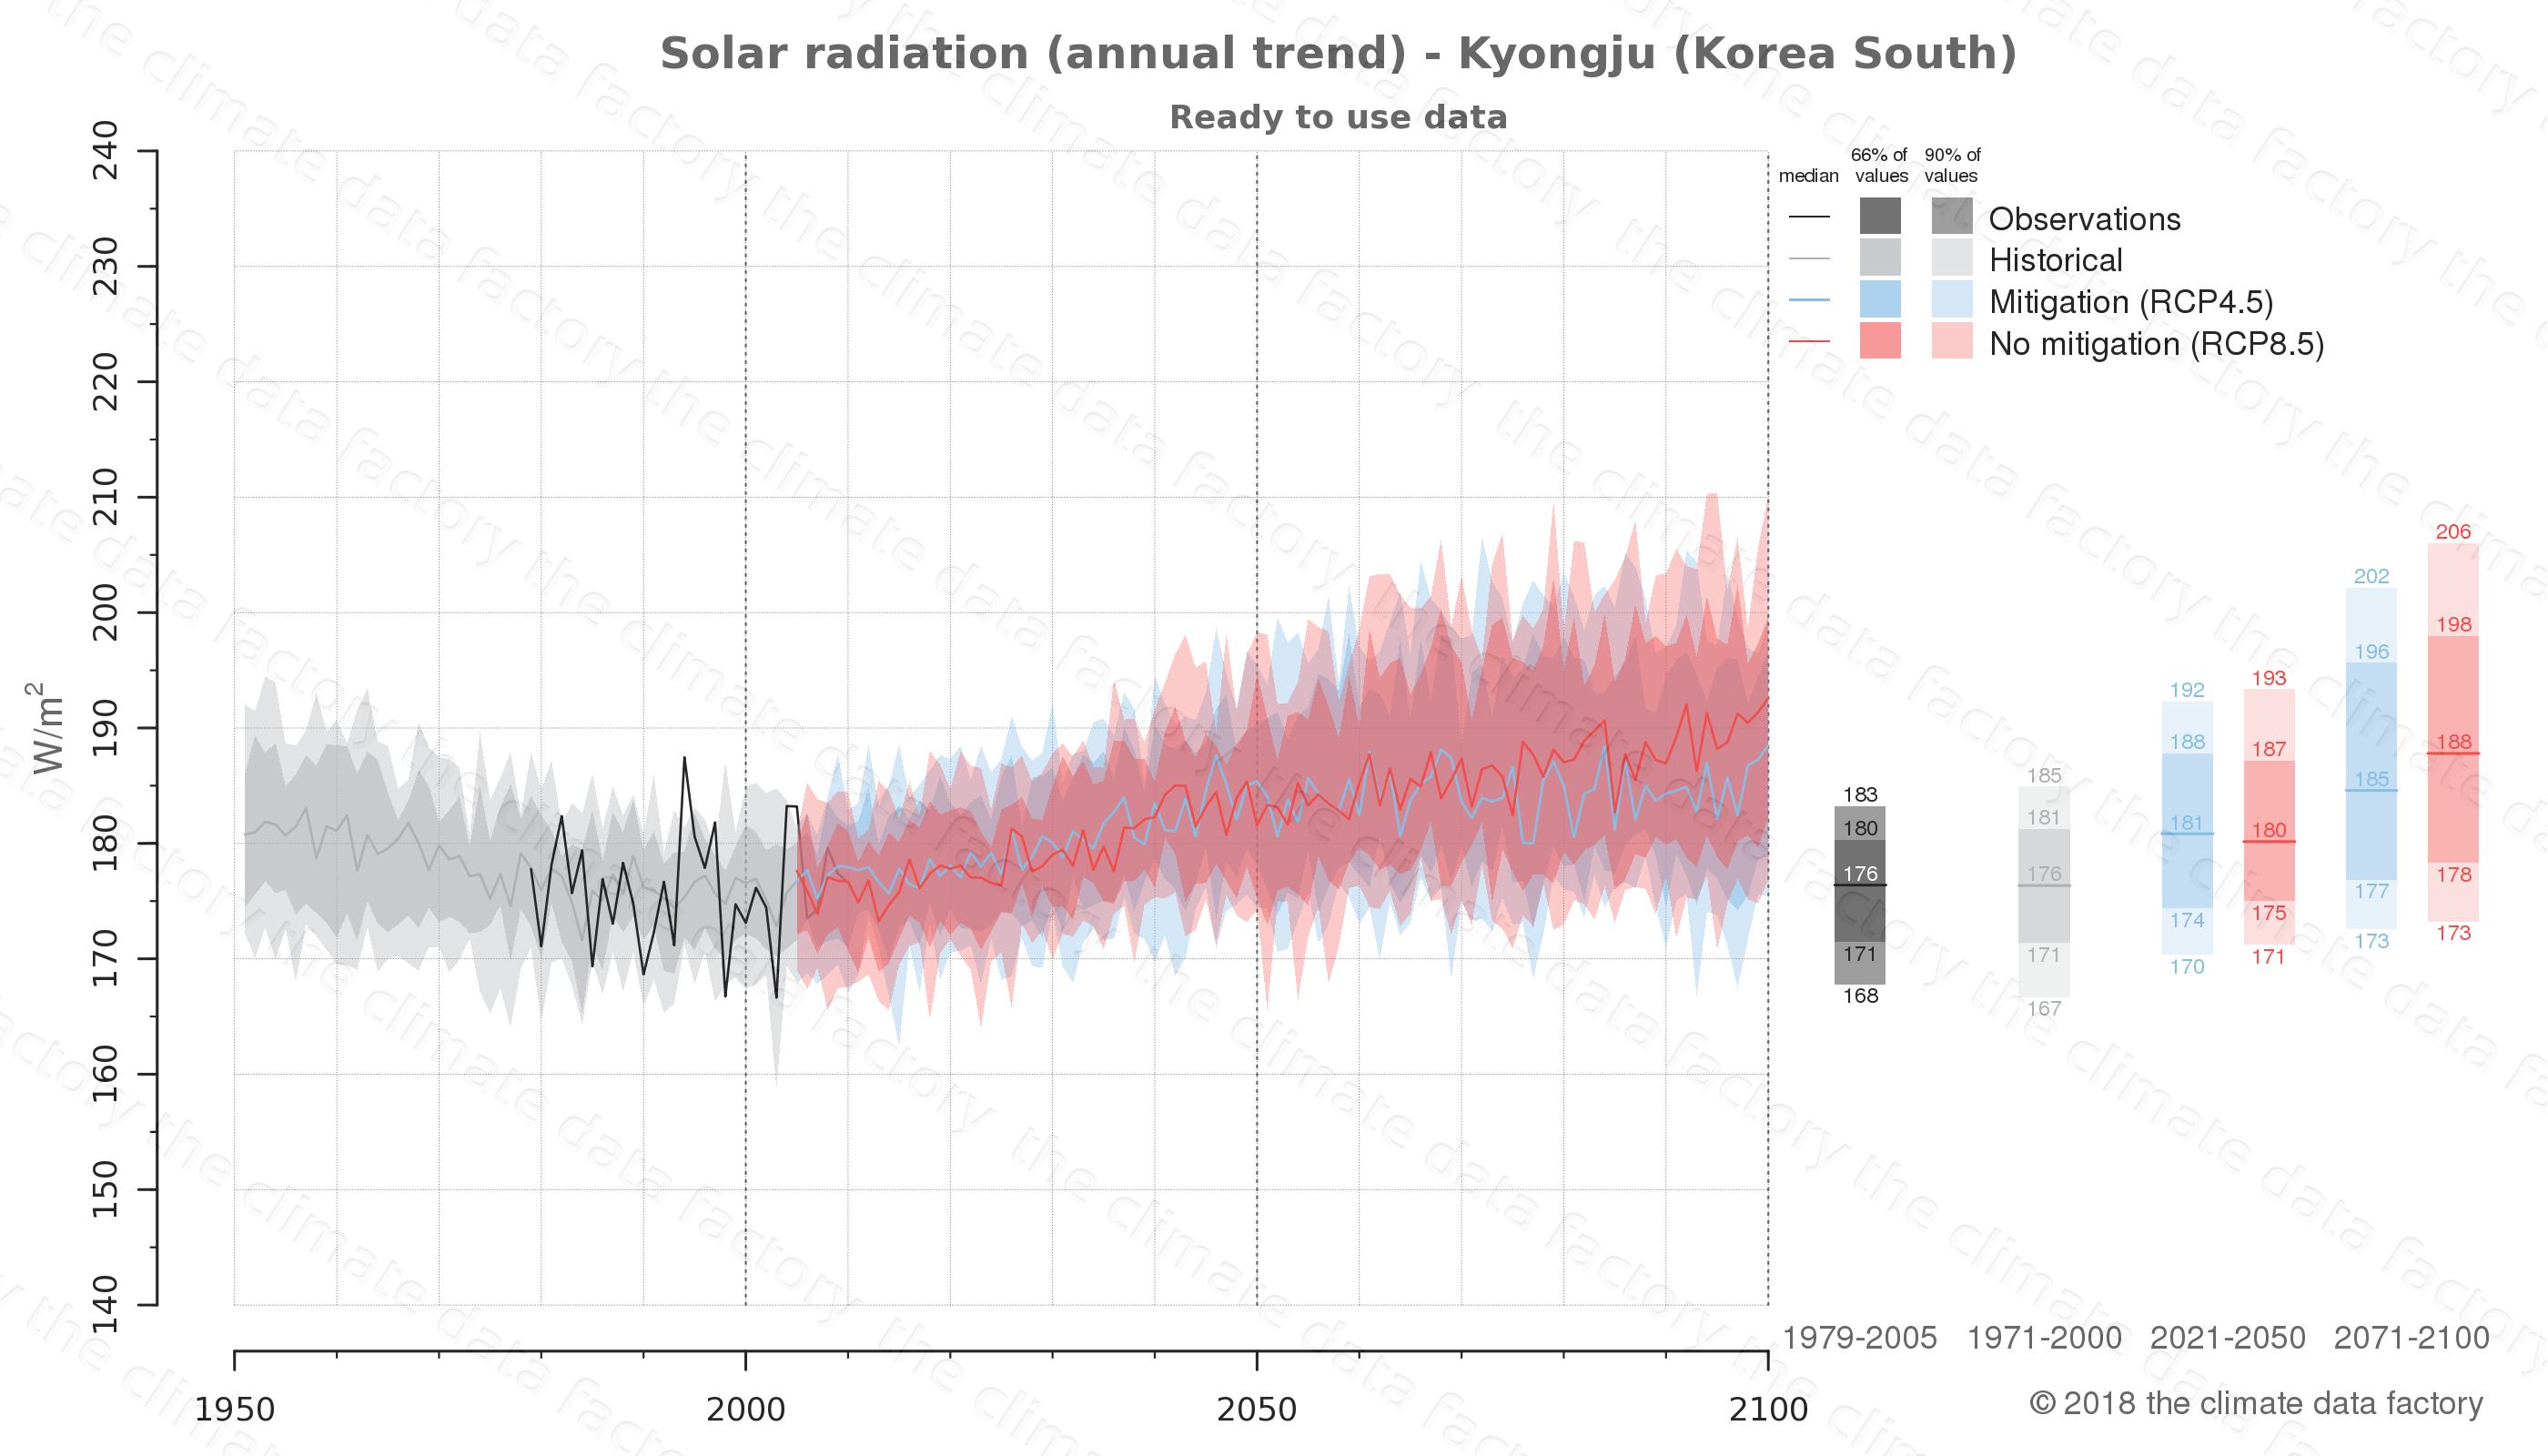 climate change data policy adaptation climate graph city data solar-radiation kyongju south korea